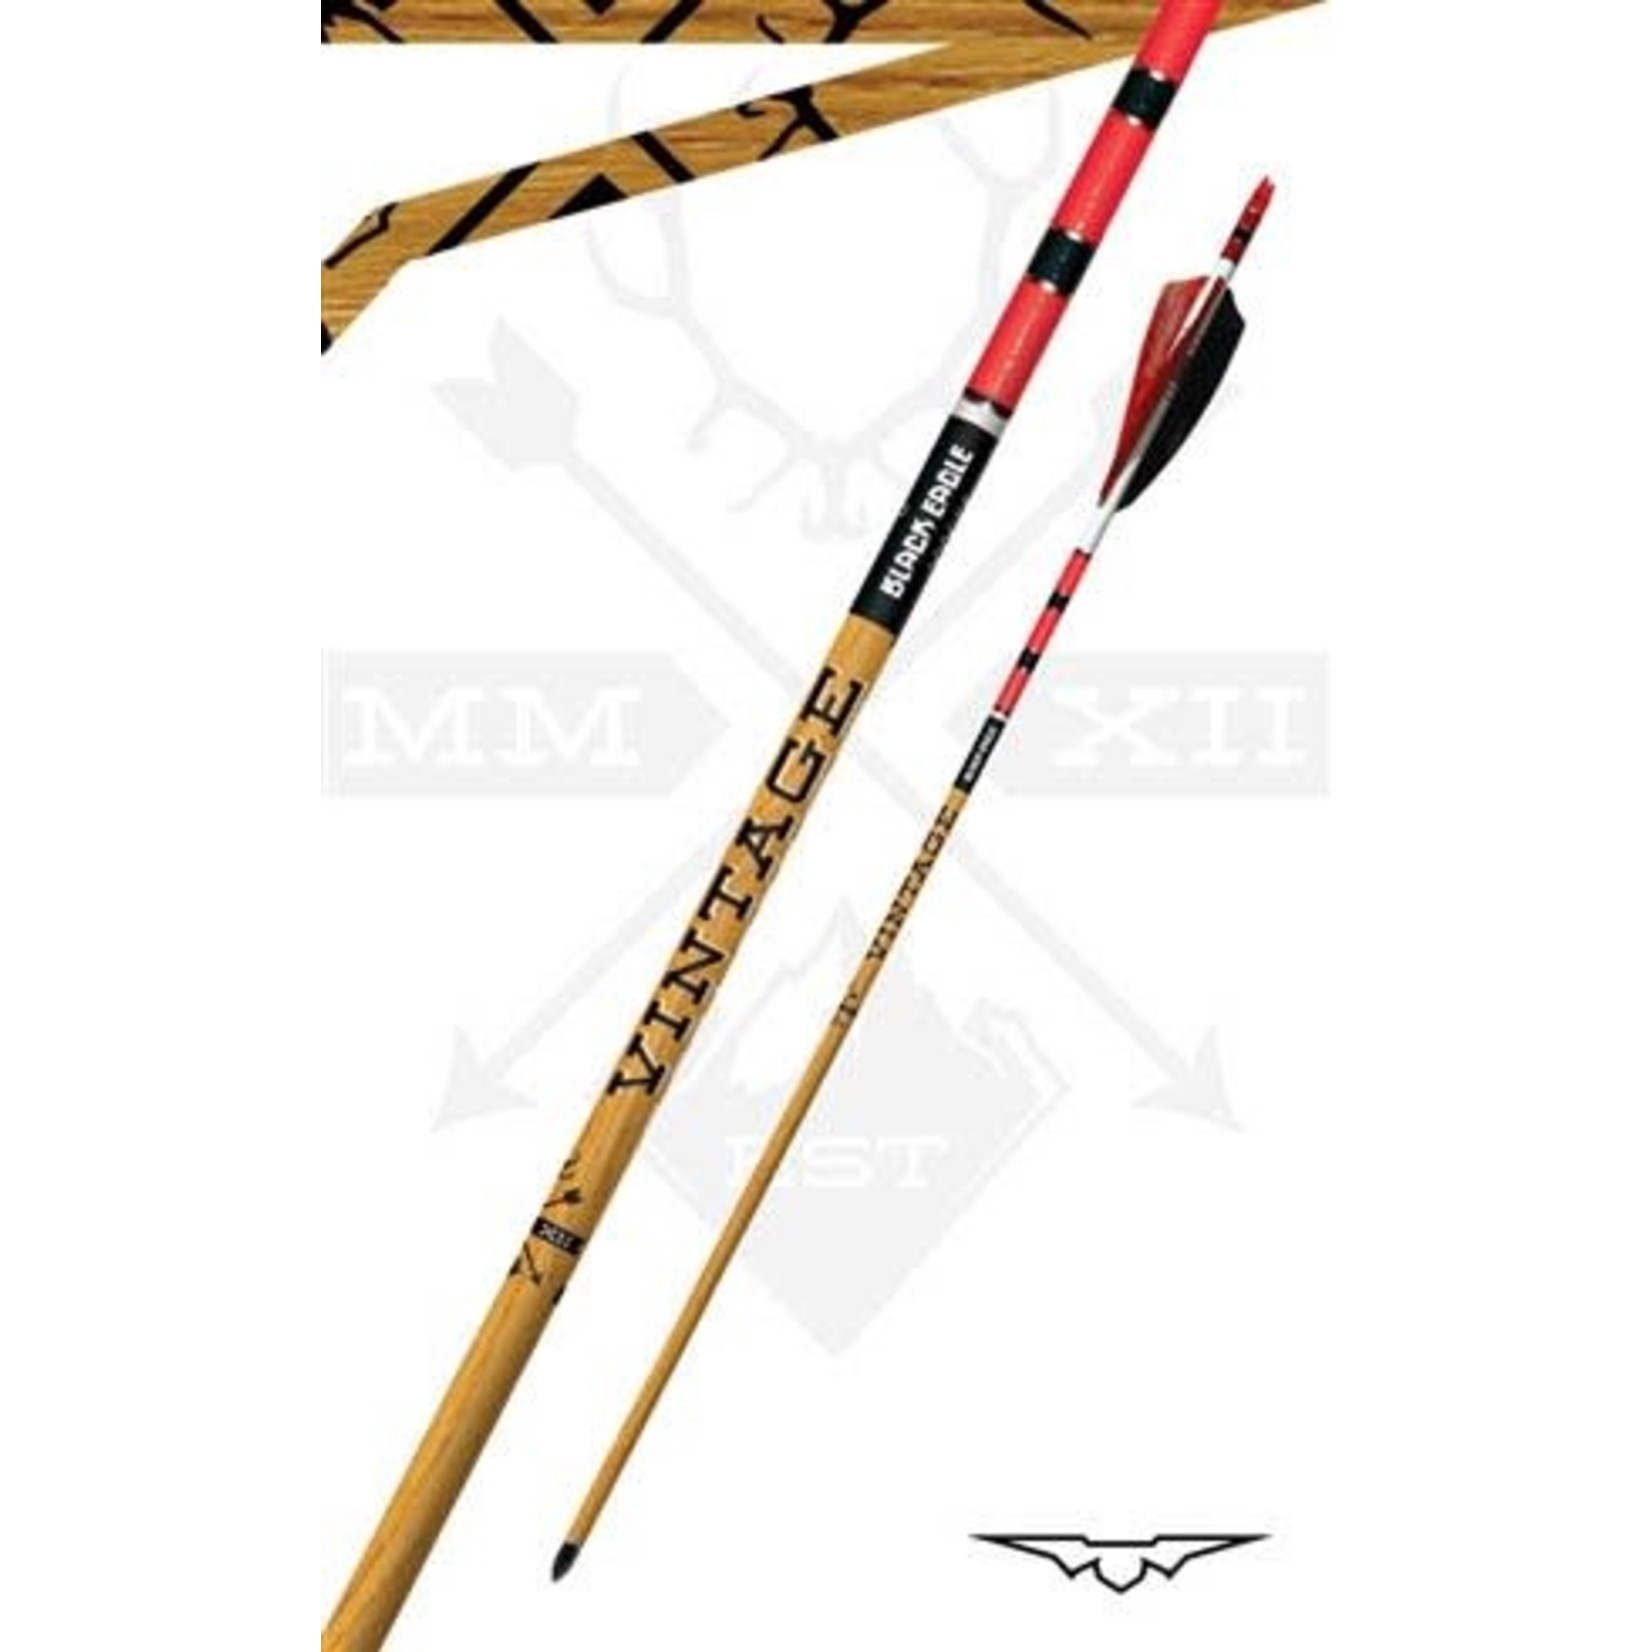 Black Eagle Black Eagle Vintage Crested Feathered Arrows  400 (6 Pk)